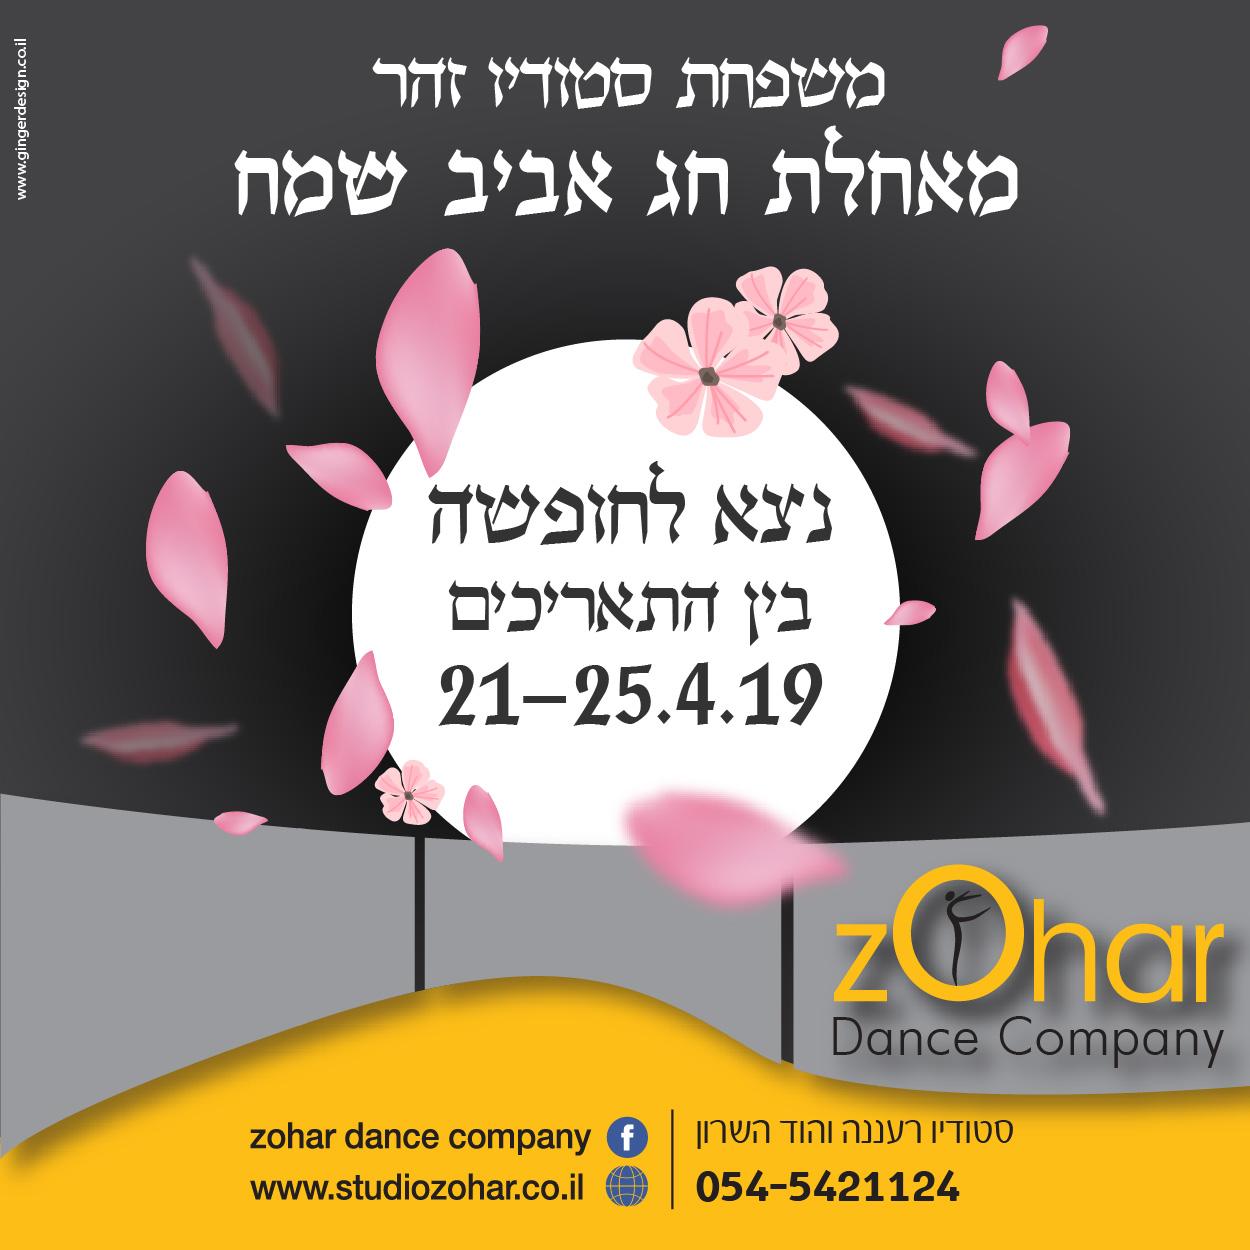 zohar 2019 passover-01